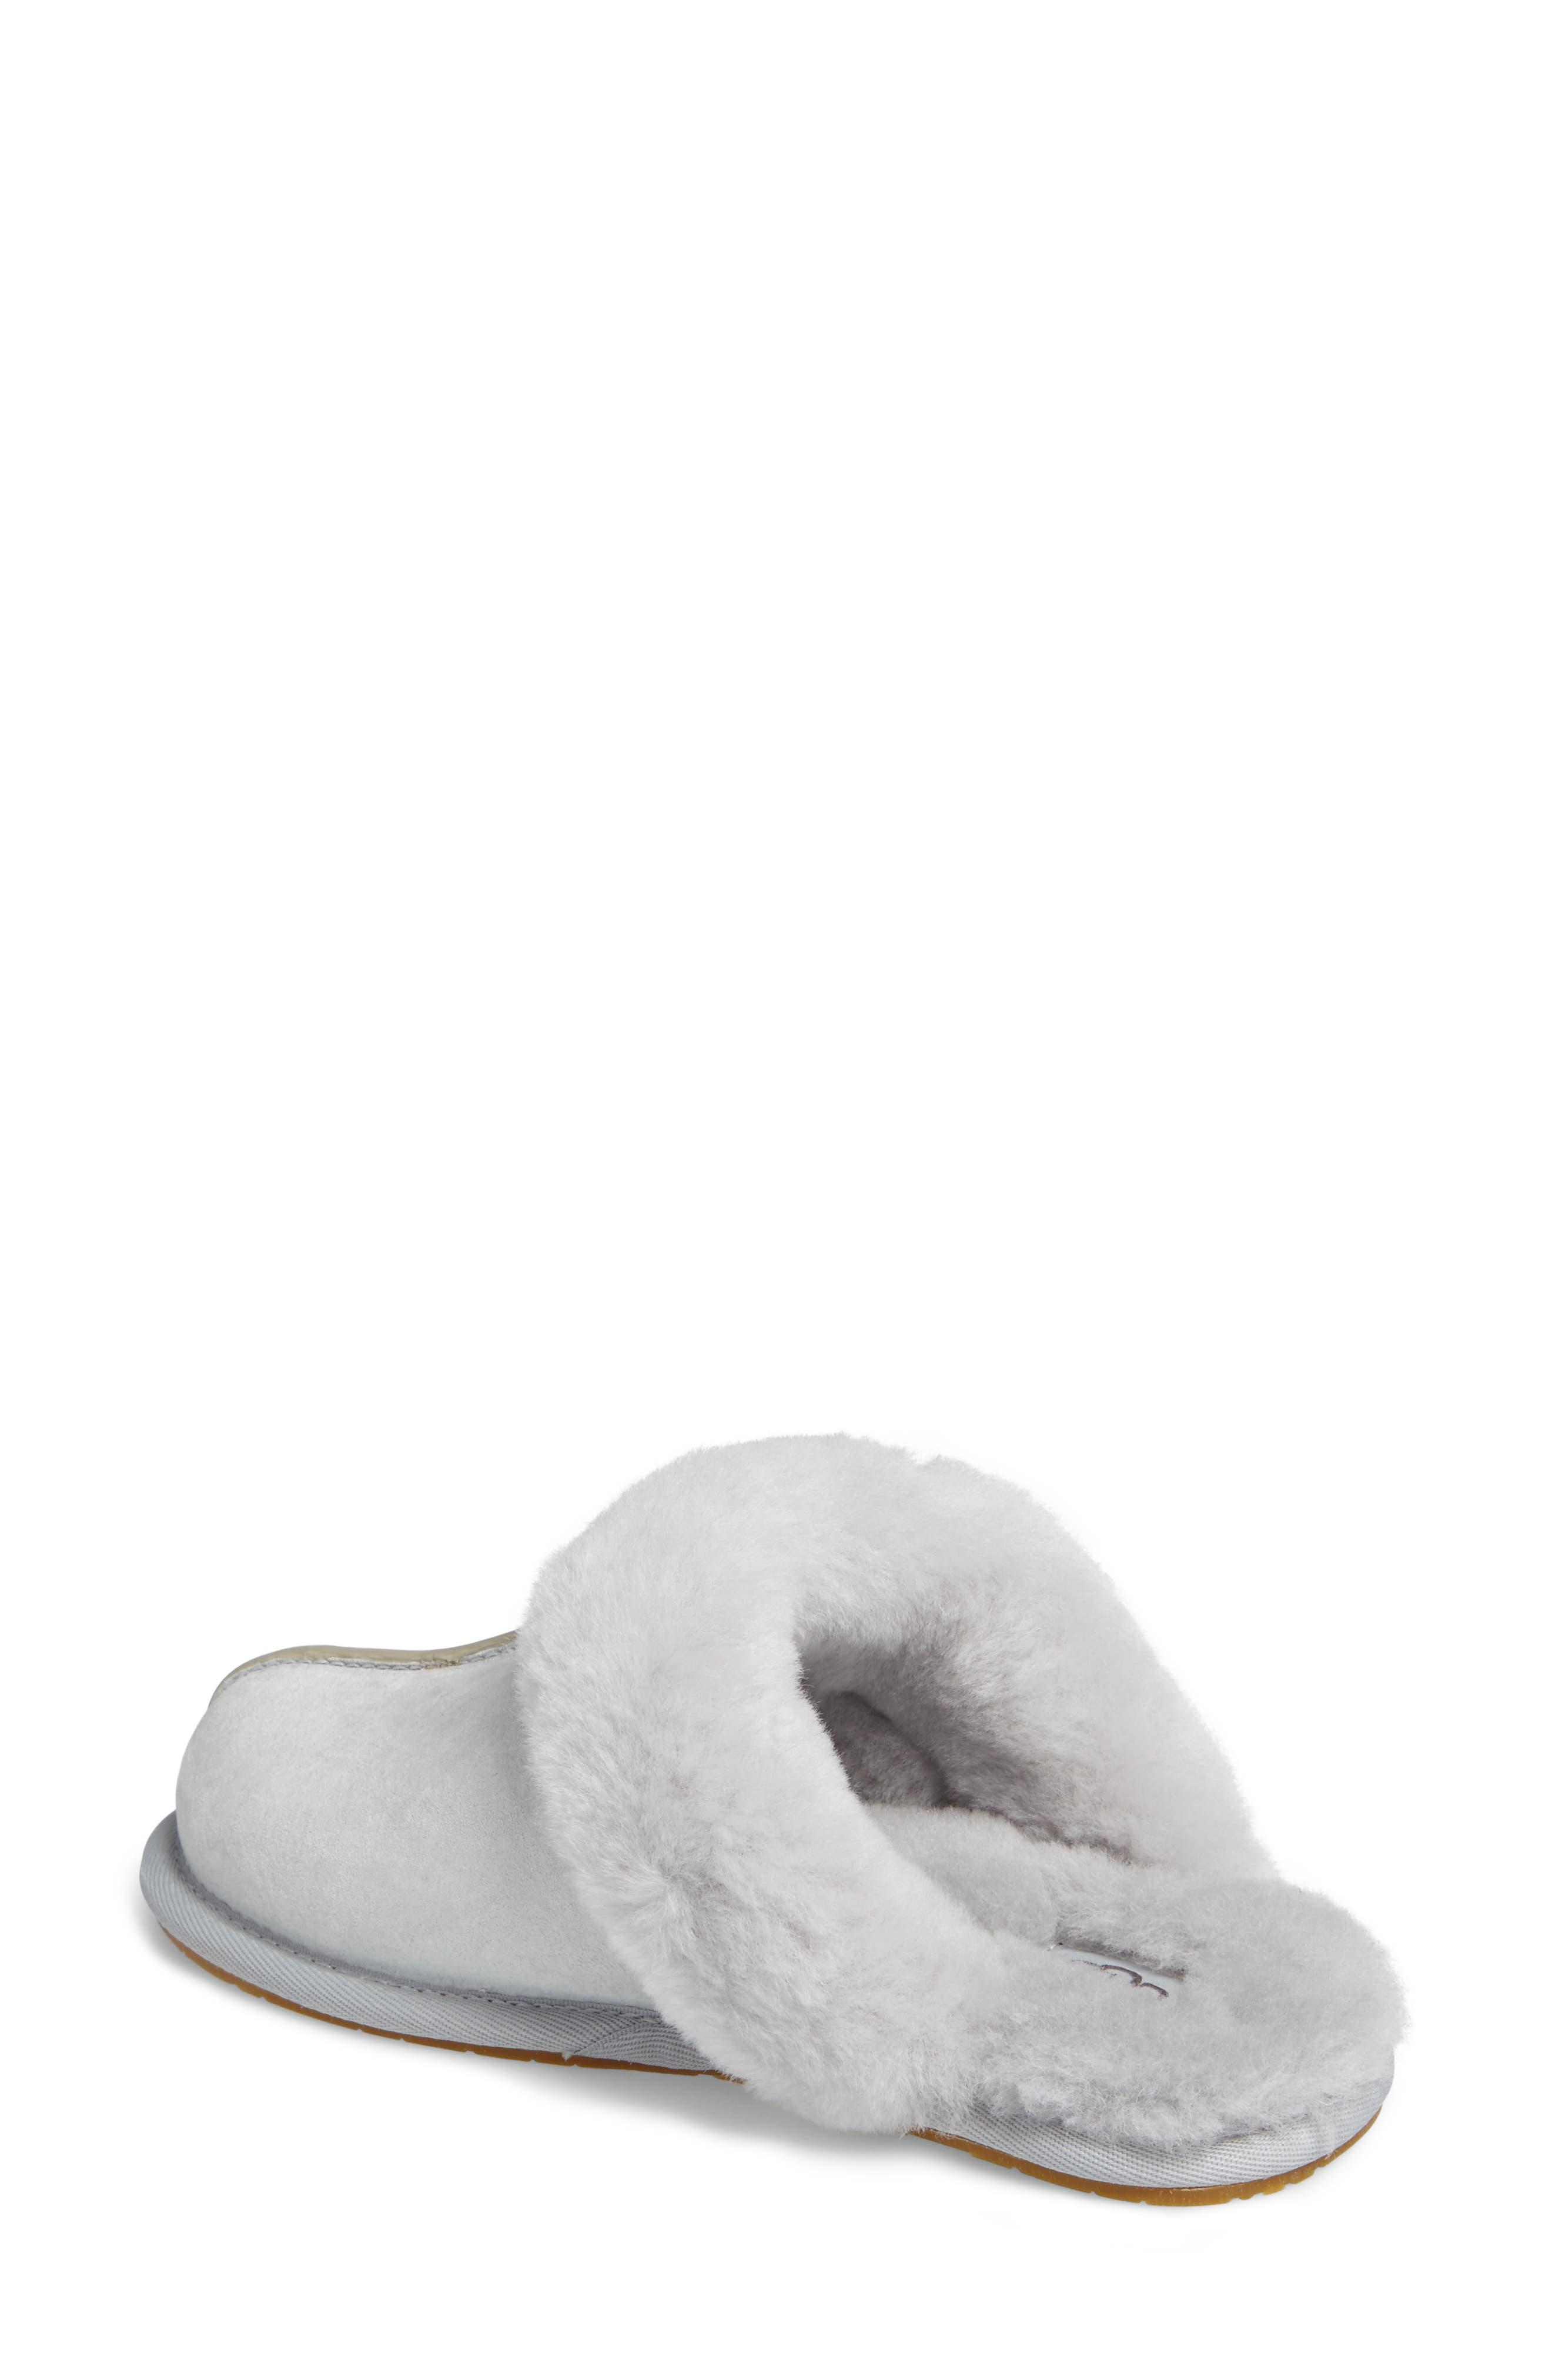 Alternate Image 2  - UGG® Scuffette II Slipper (Women)